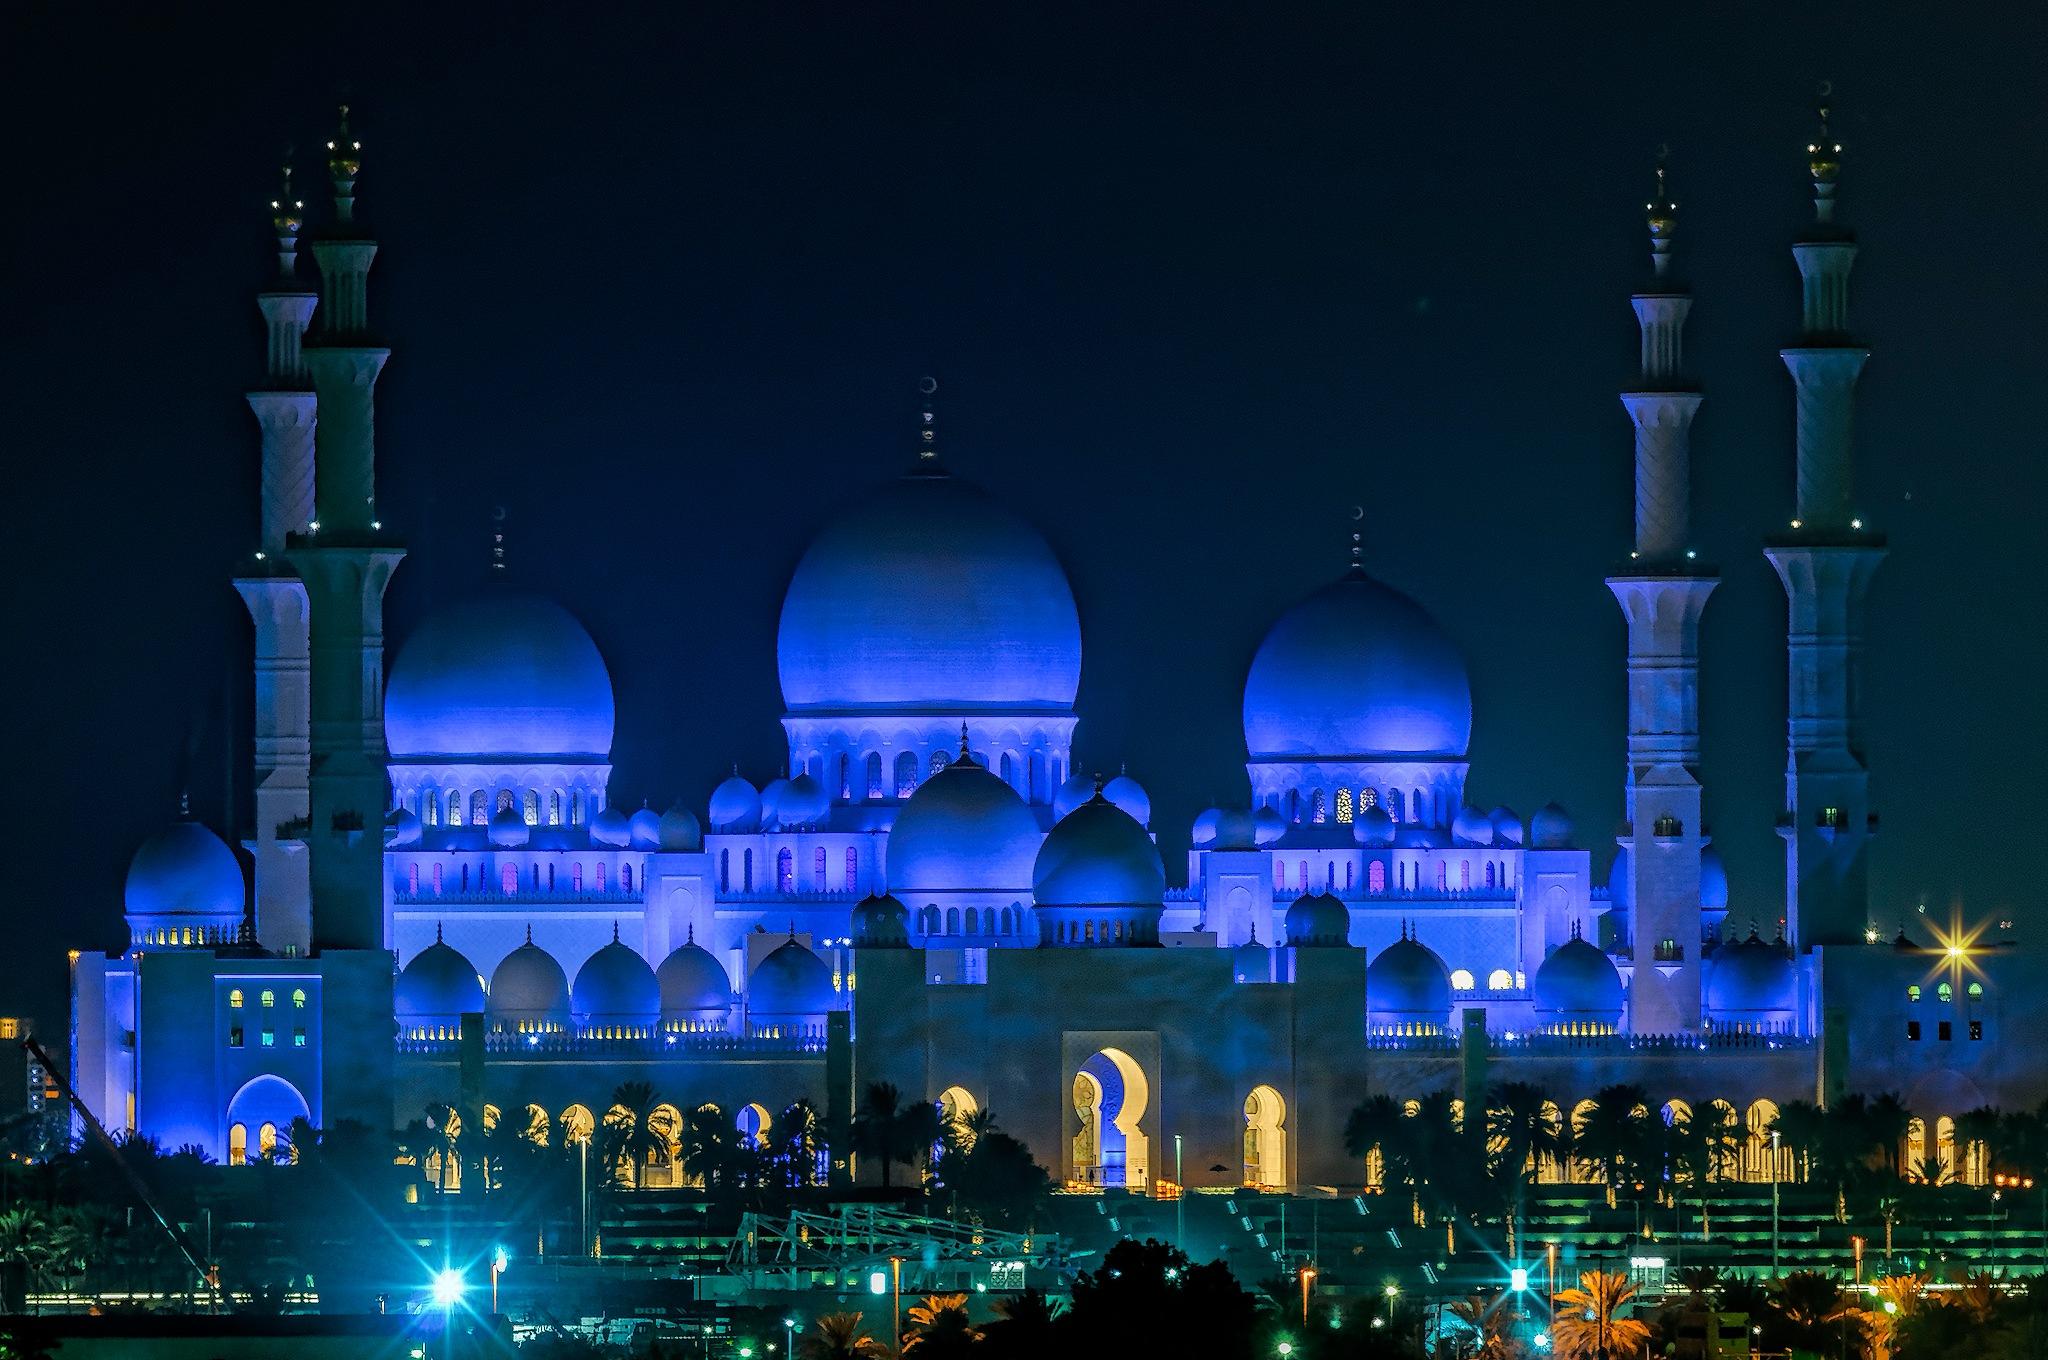 The Mosque by Herbert Stachelberger